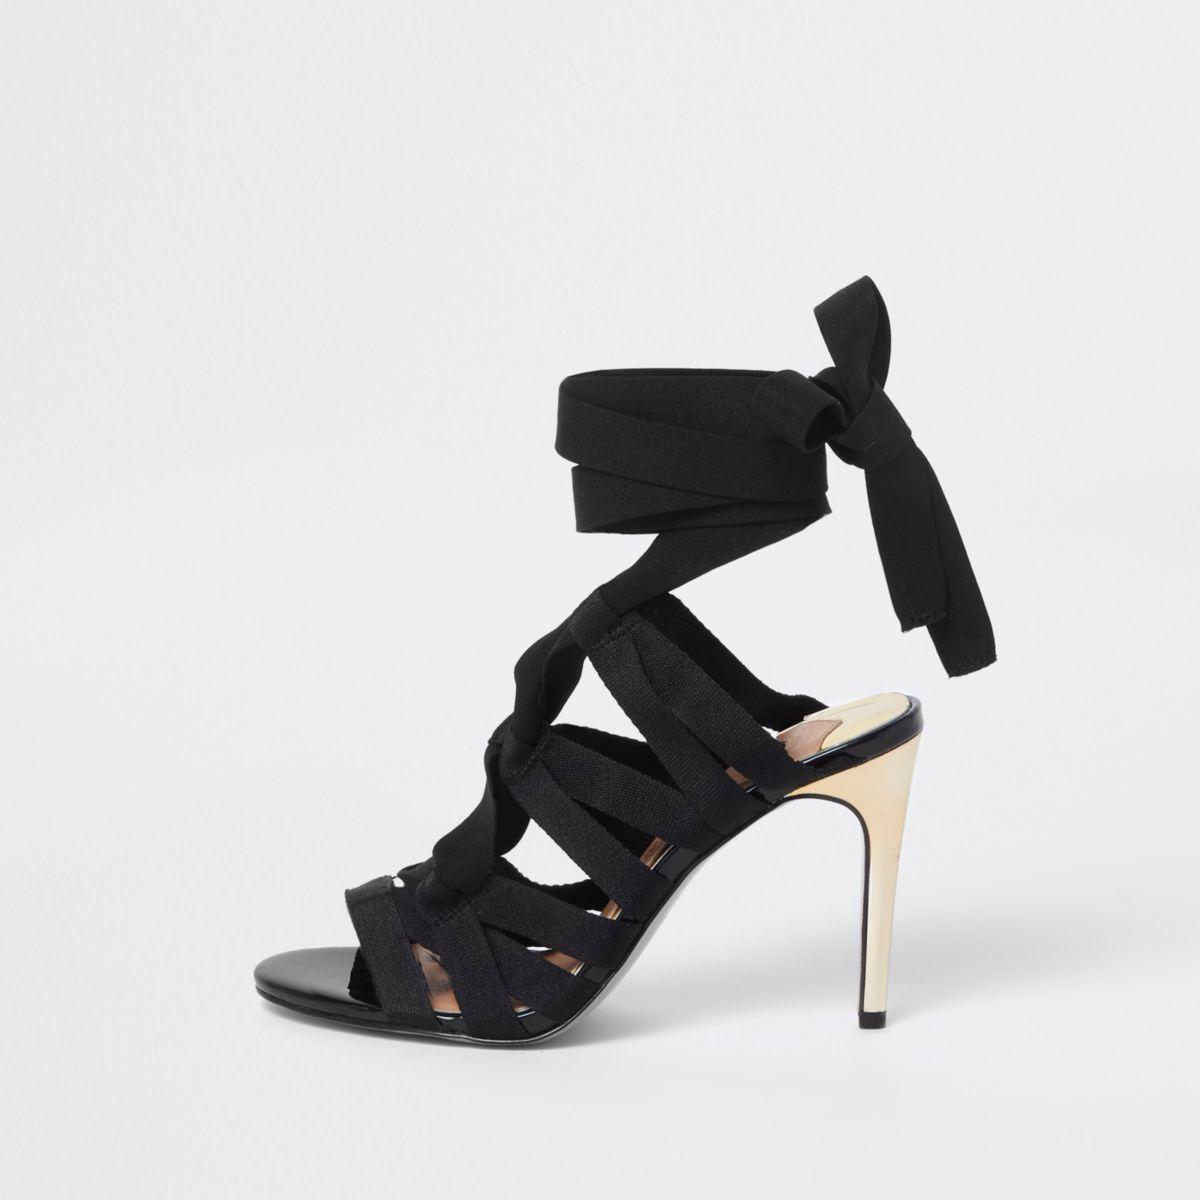 Black caged tie up sandals